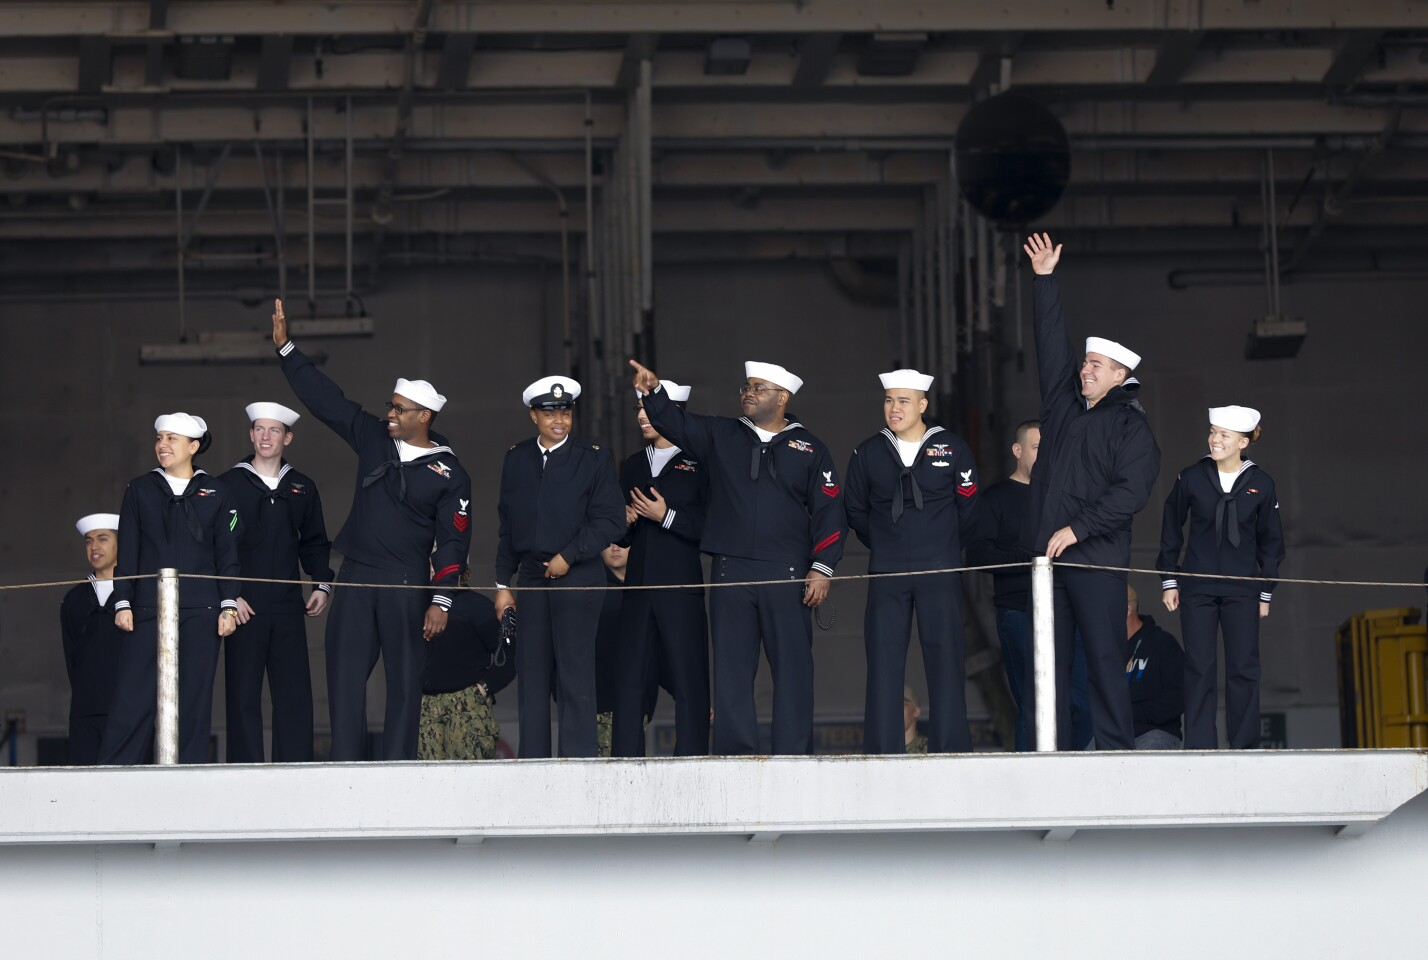 USS Abraham Lincoln (CVN 72) arrives in San Diego